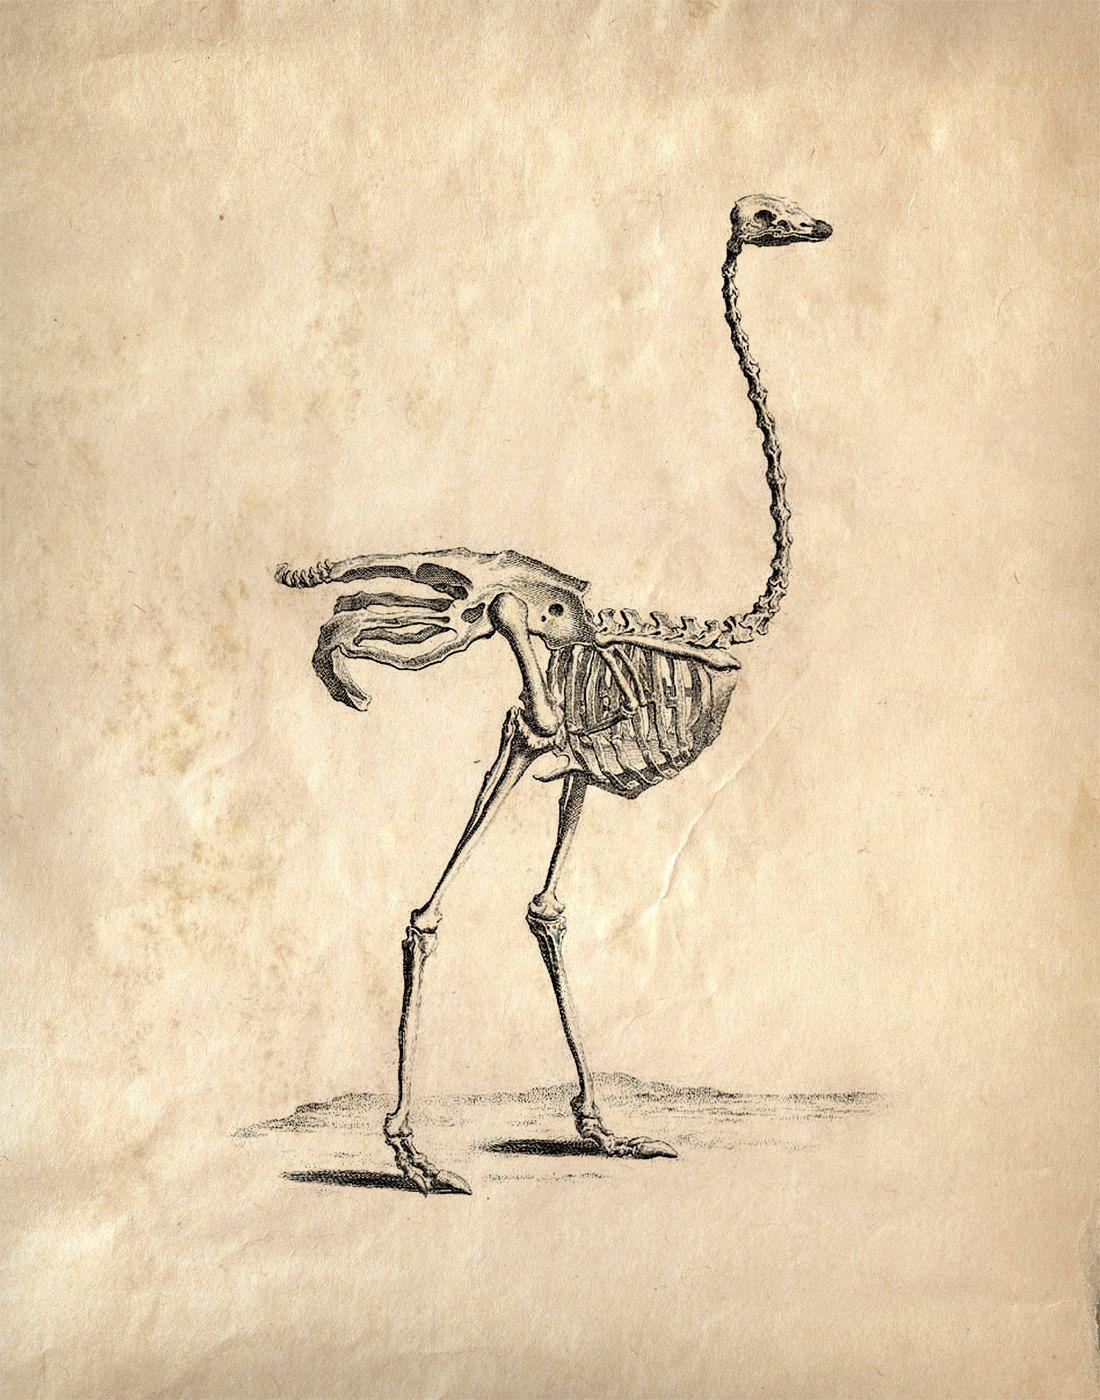 ostrich skeleton diagram 2006 gmc yukon radio wiring popular items for animal study on etsy photography art